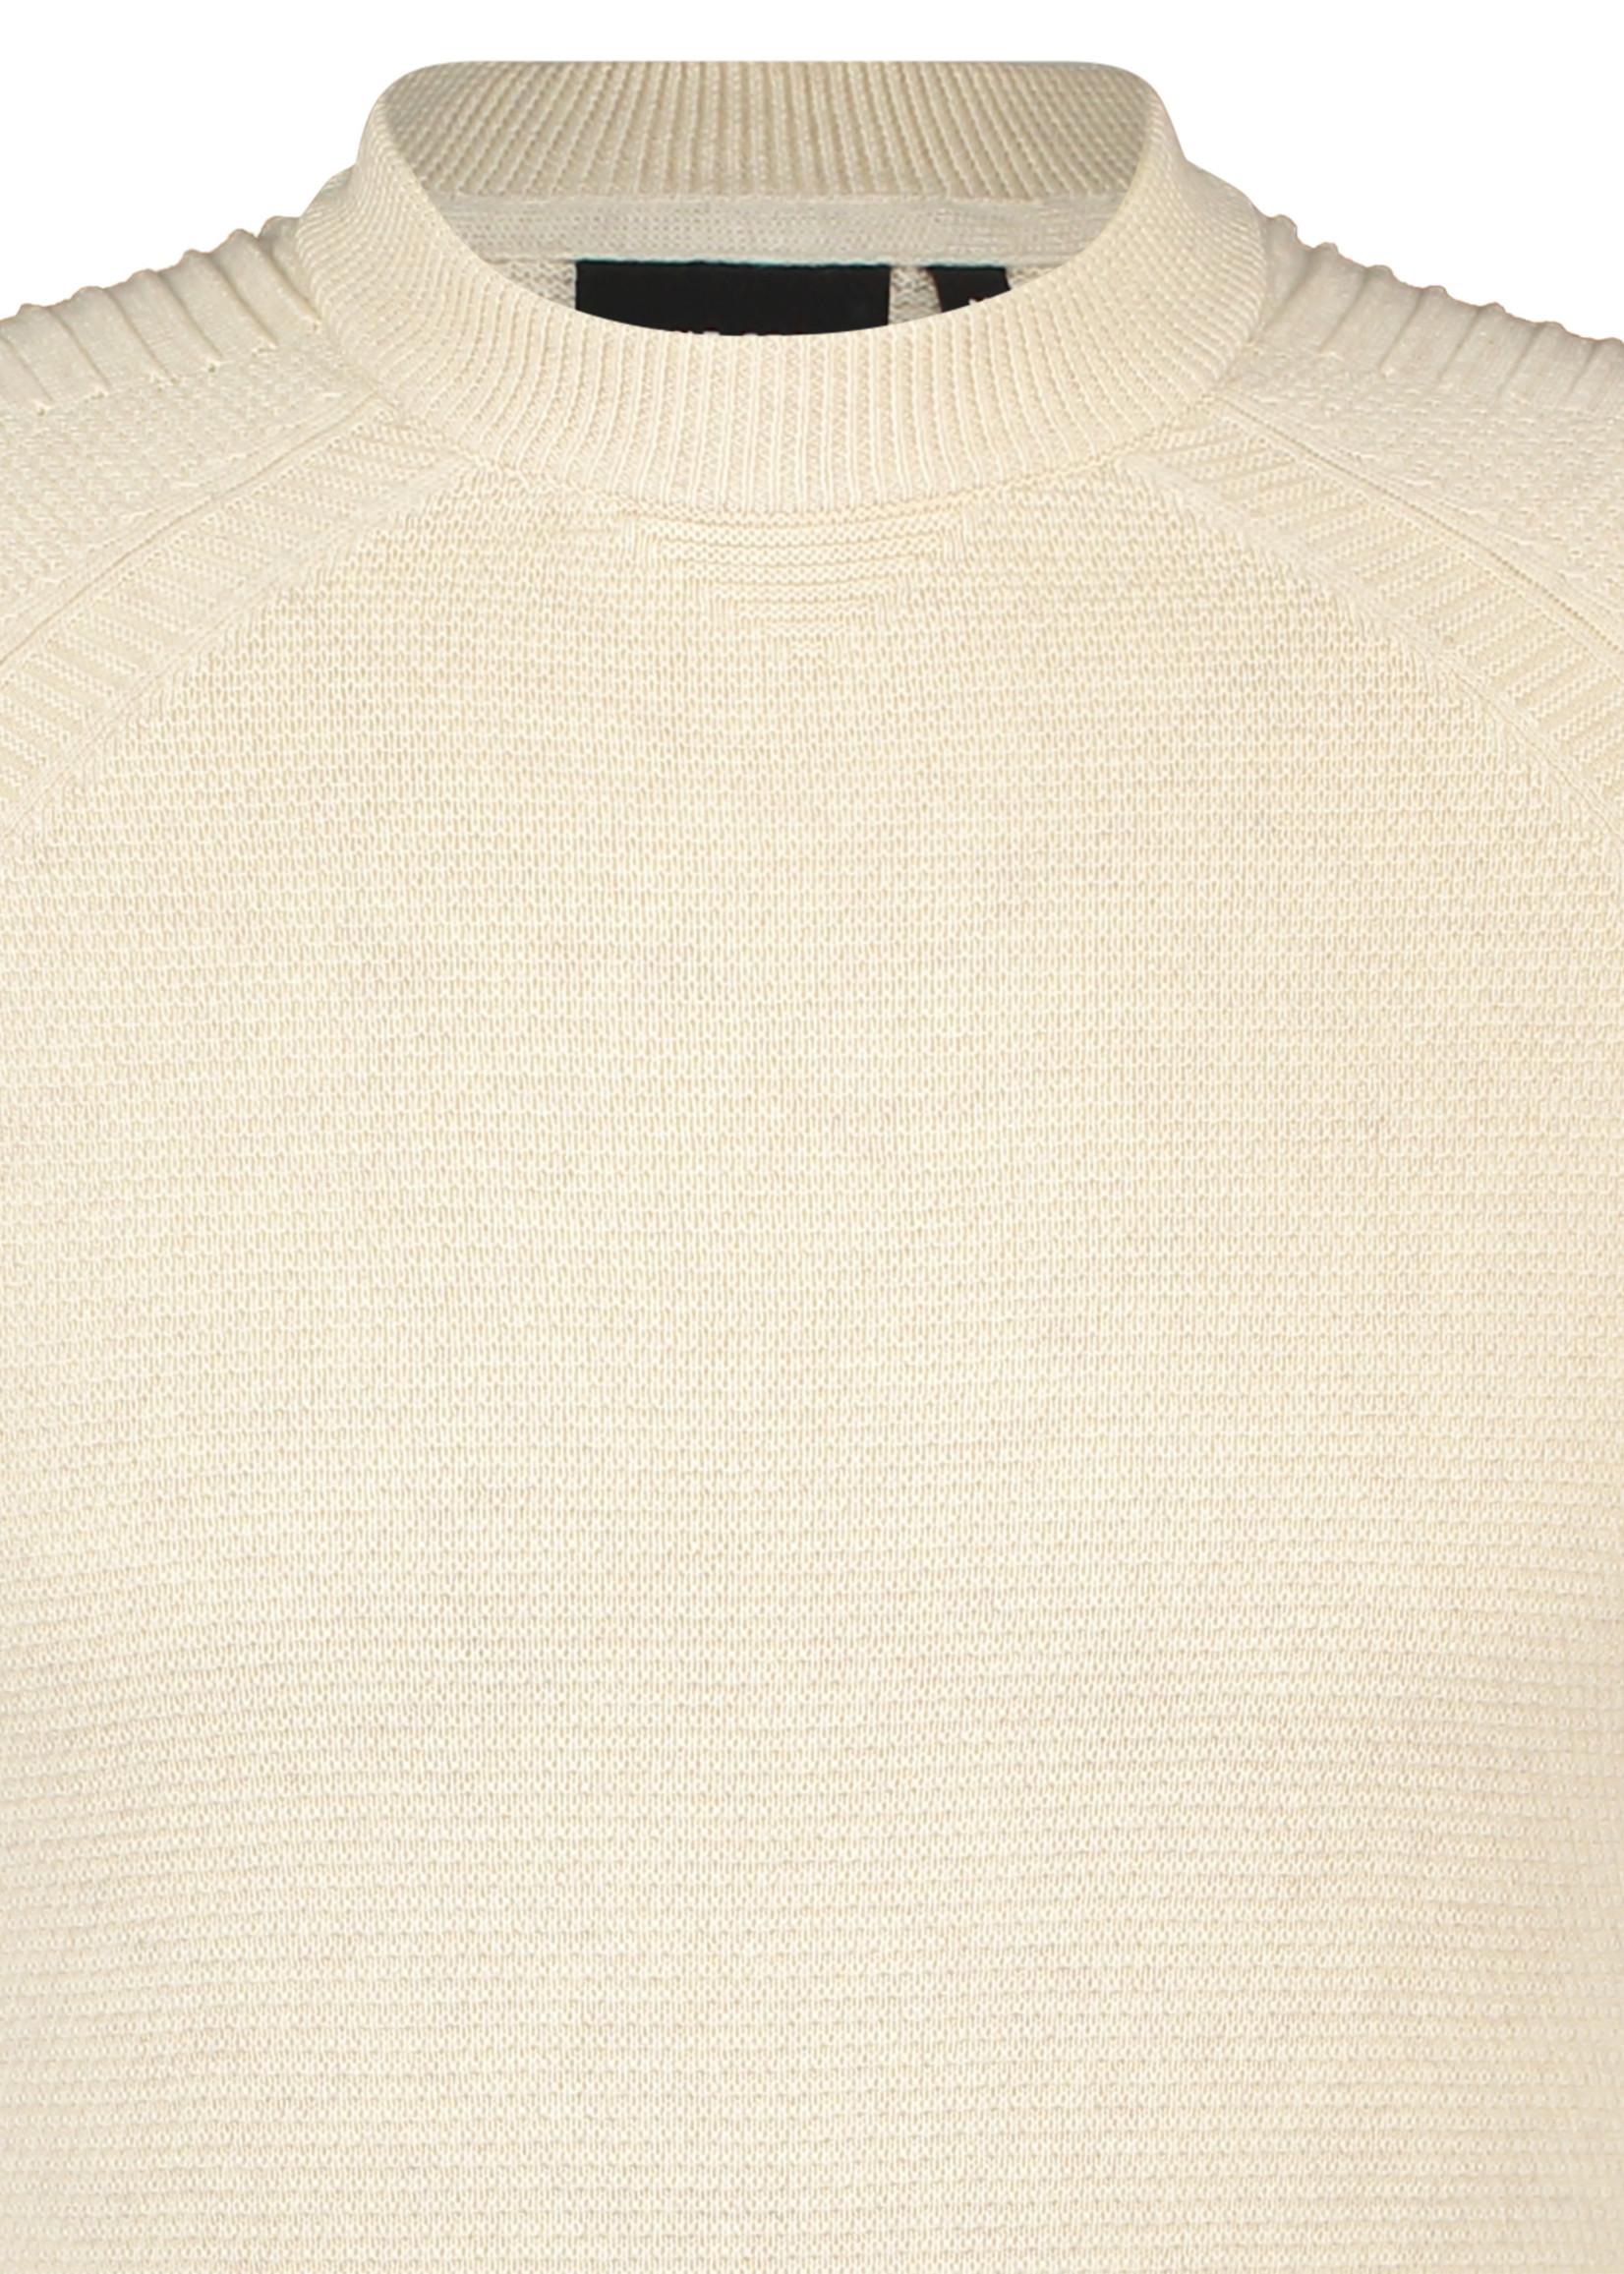 Saint Steve Freek Knit